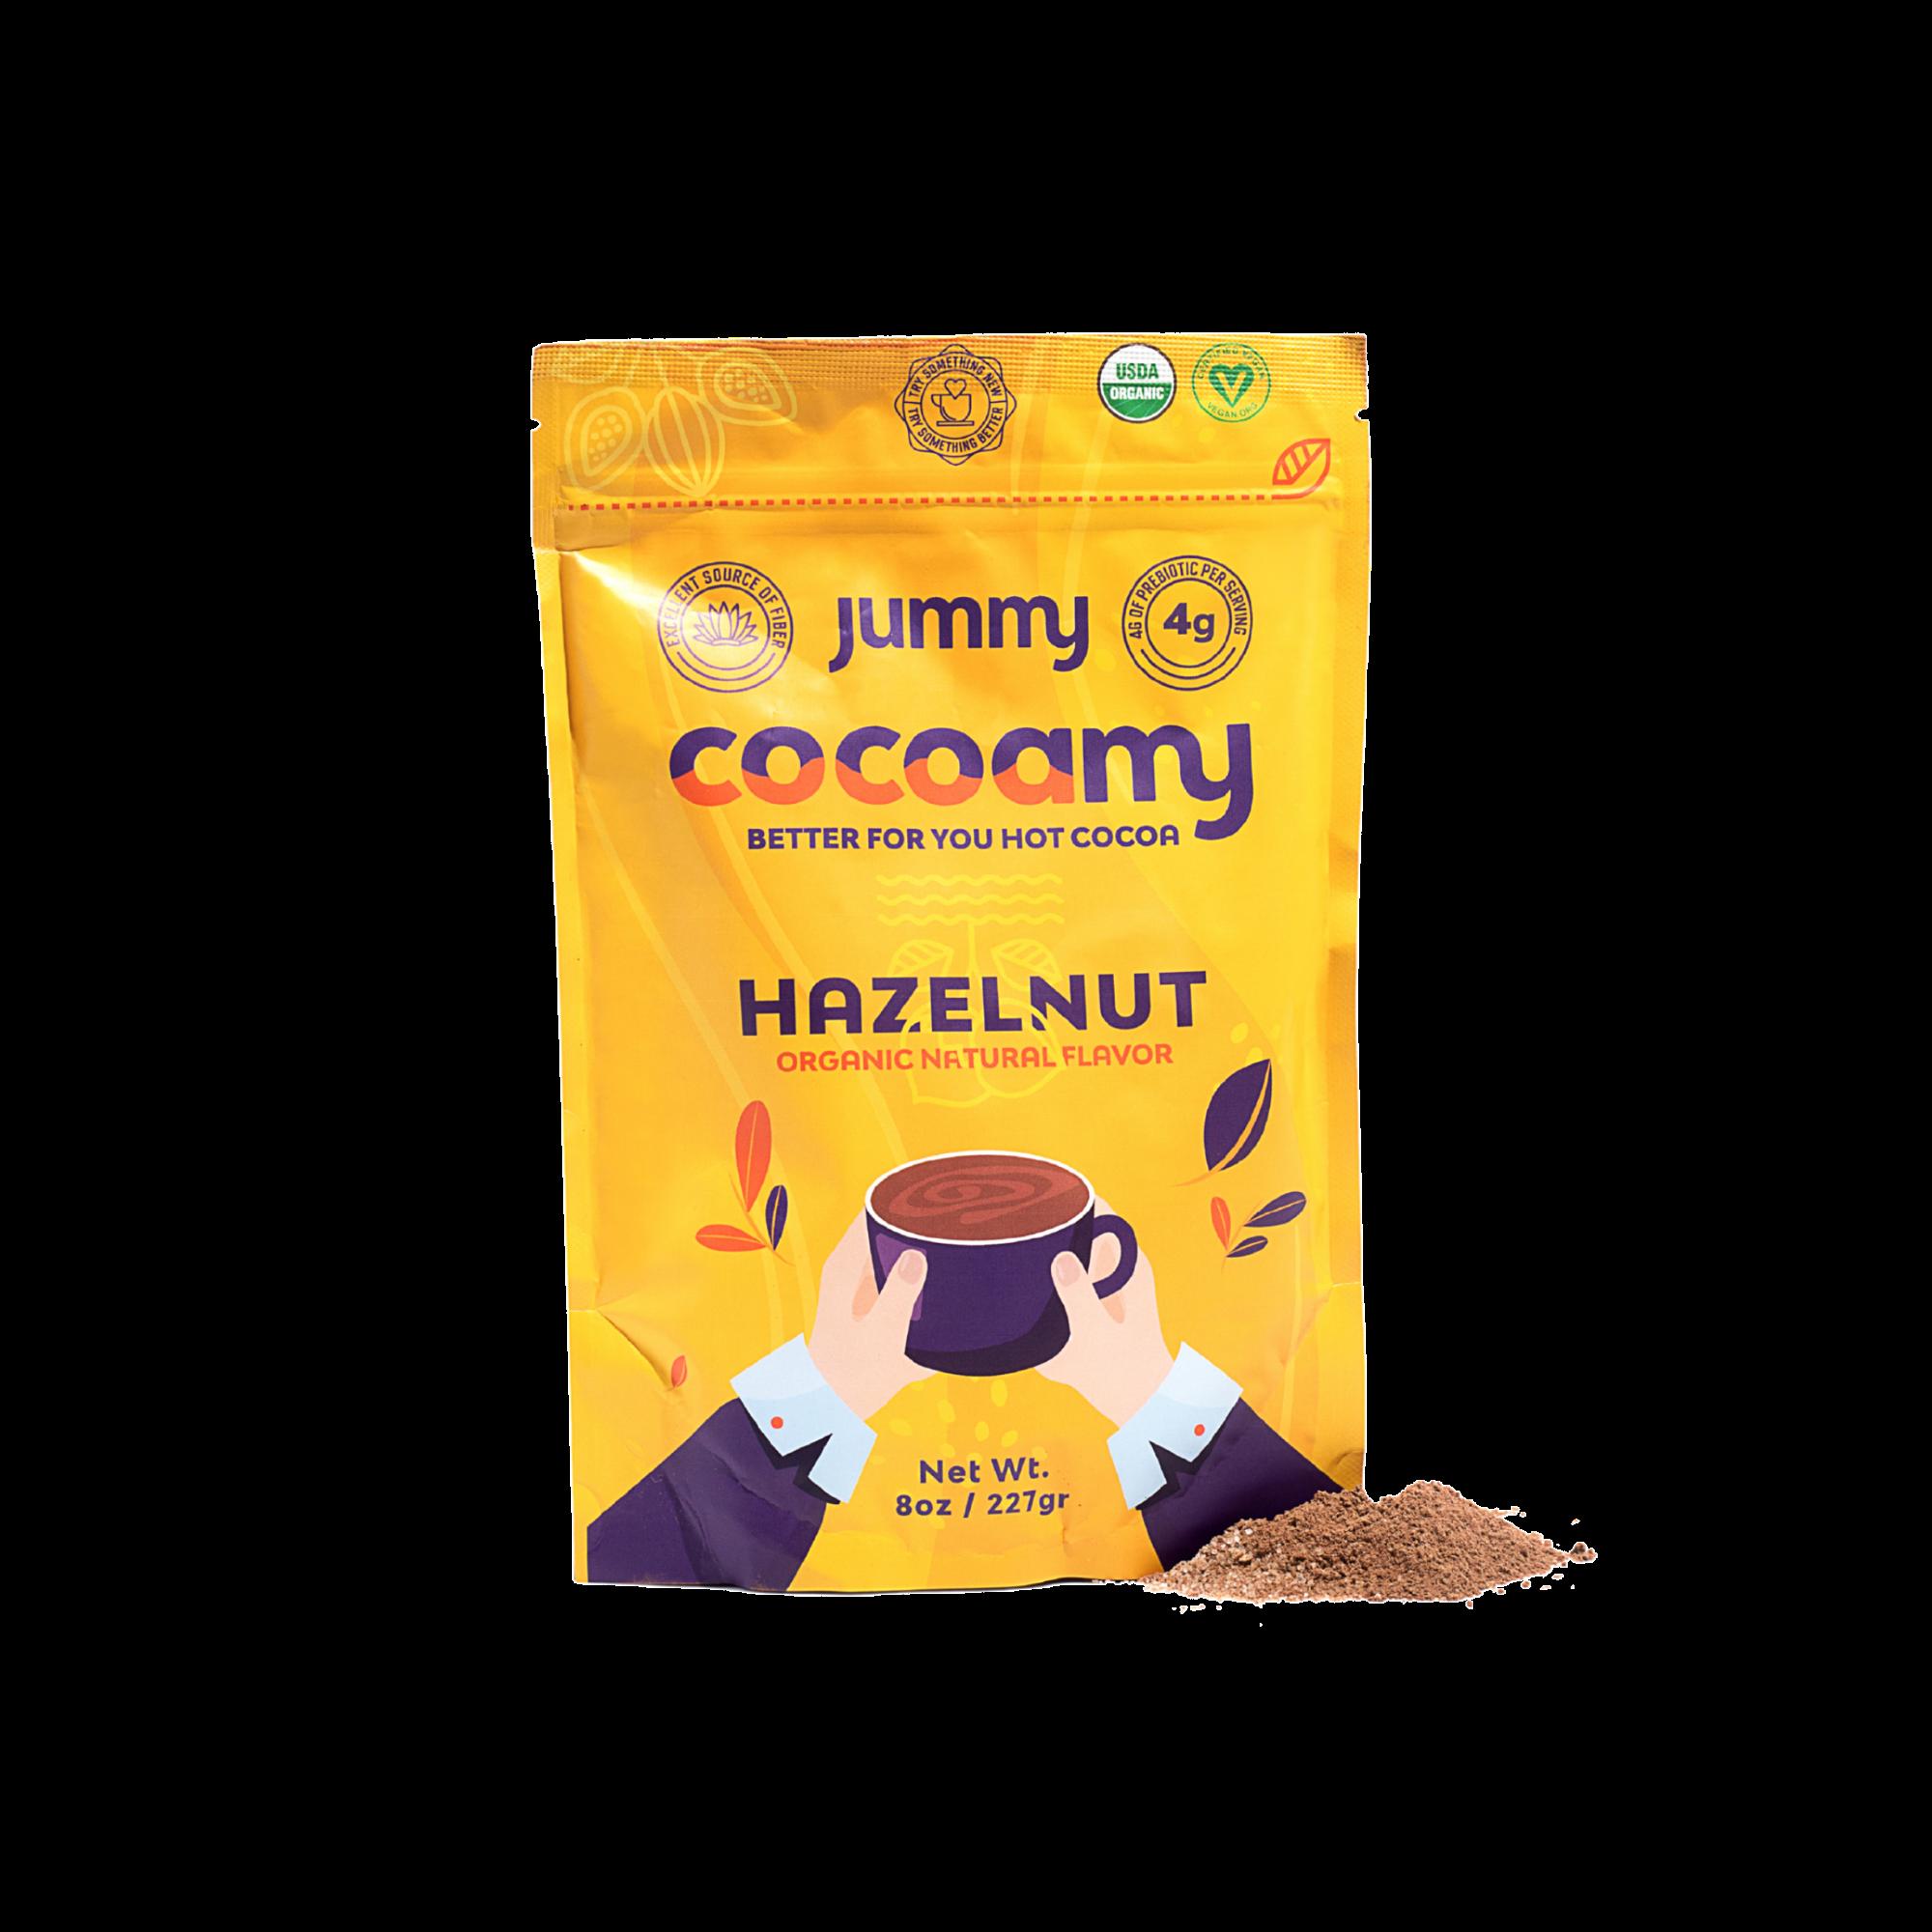 Jummy - Cocoamy Organic Hot Cocoa Hazelnut Flavor